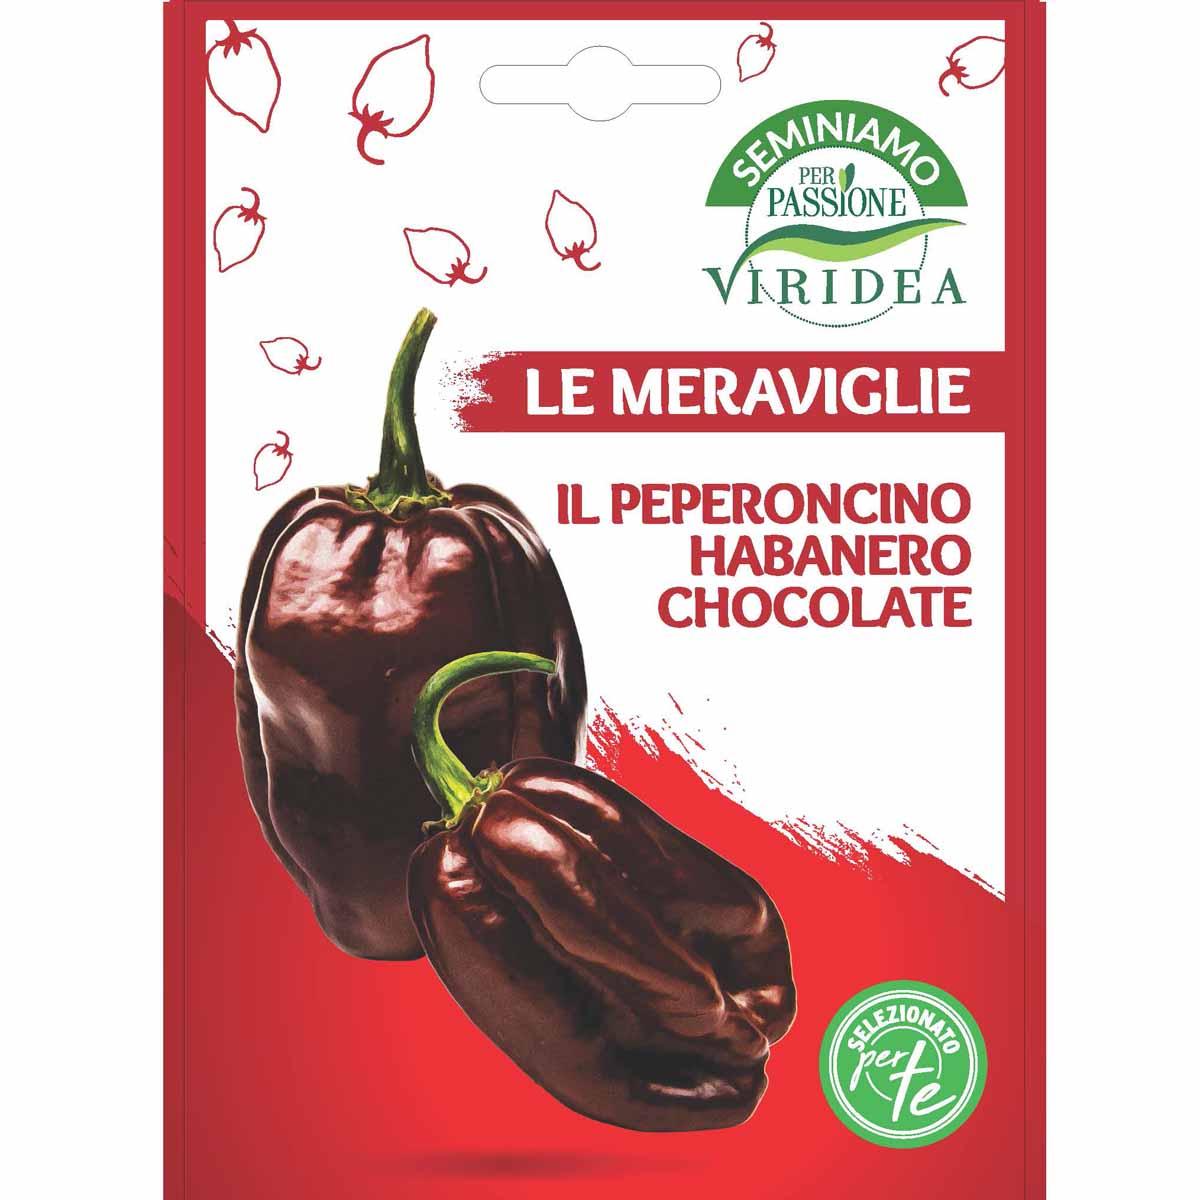 Sementi Le Meraviglie – Peperoncino Habanero Chocolate